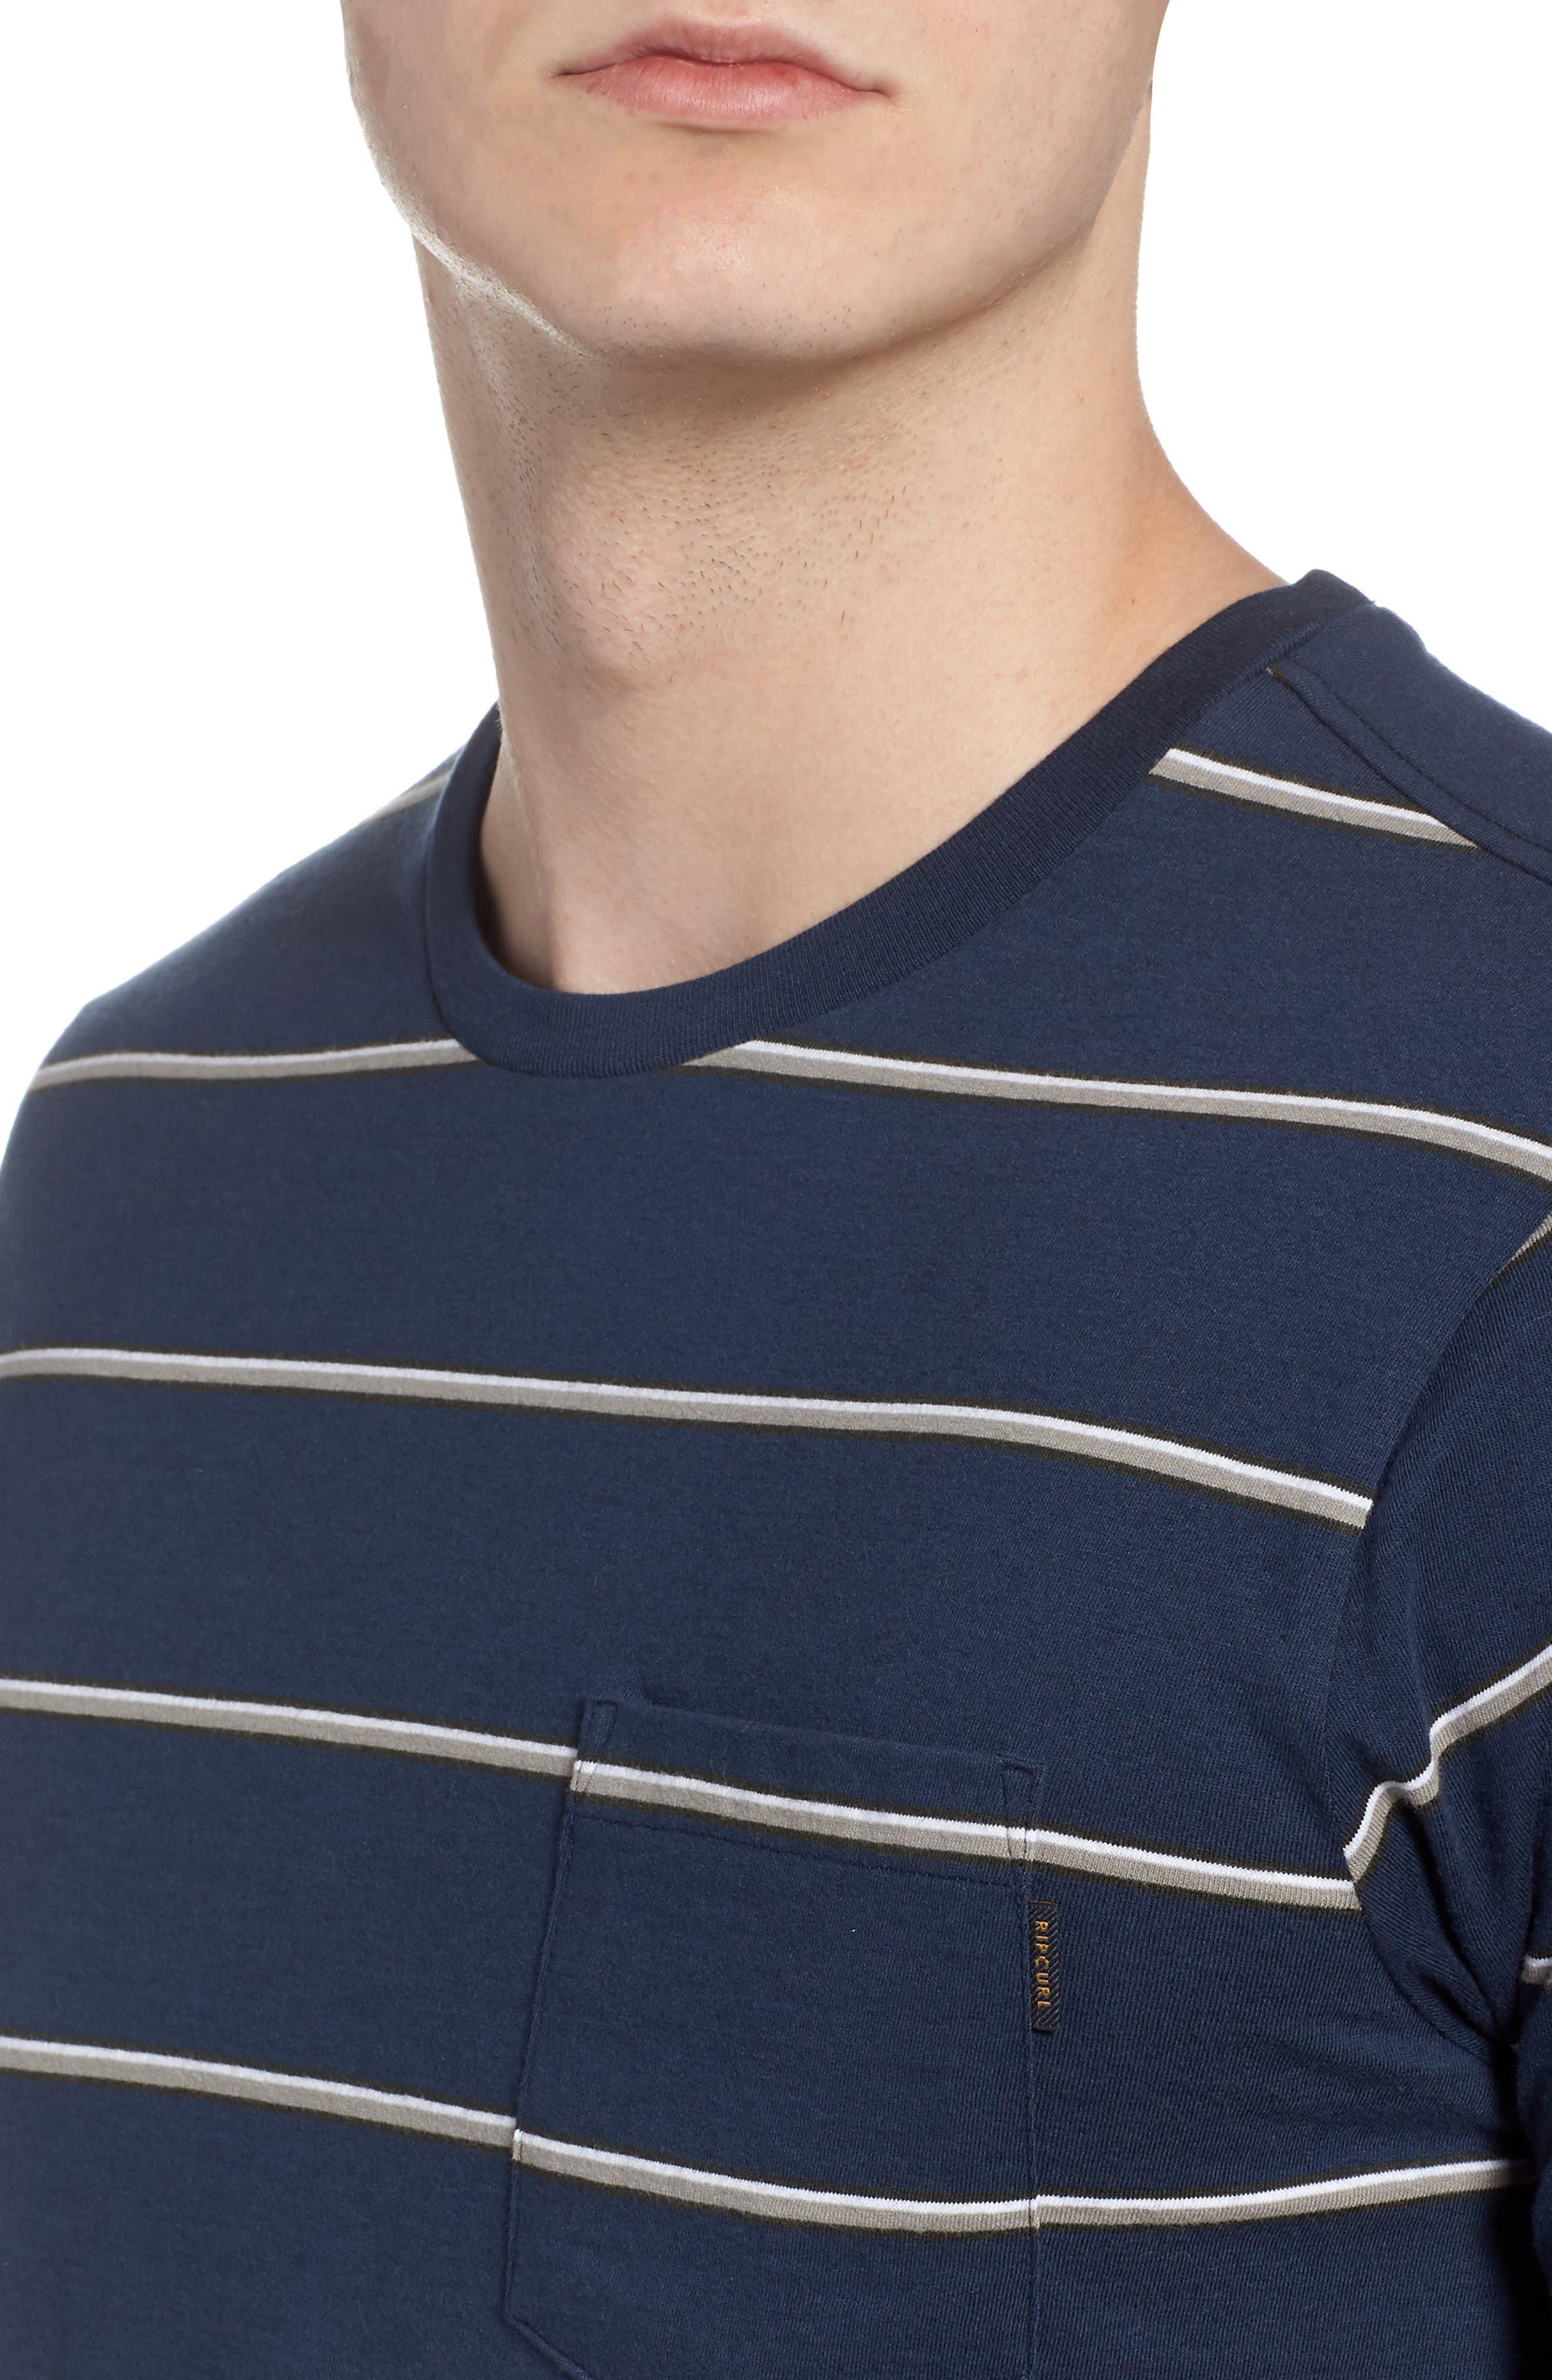 Prospect T-Shirt,                             Alternate thumbnail 11, color,